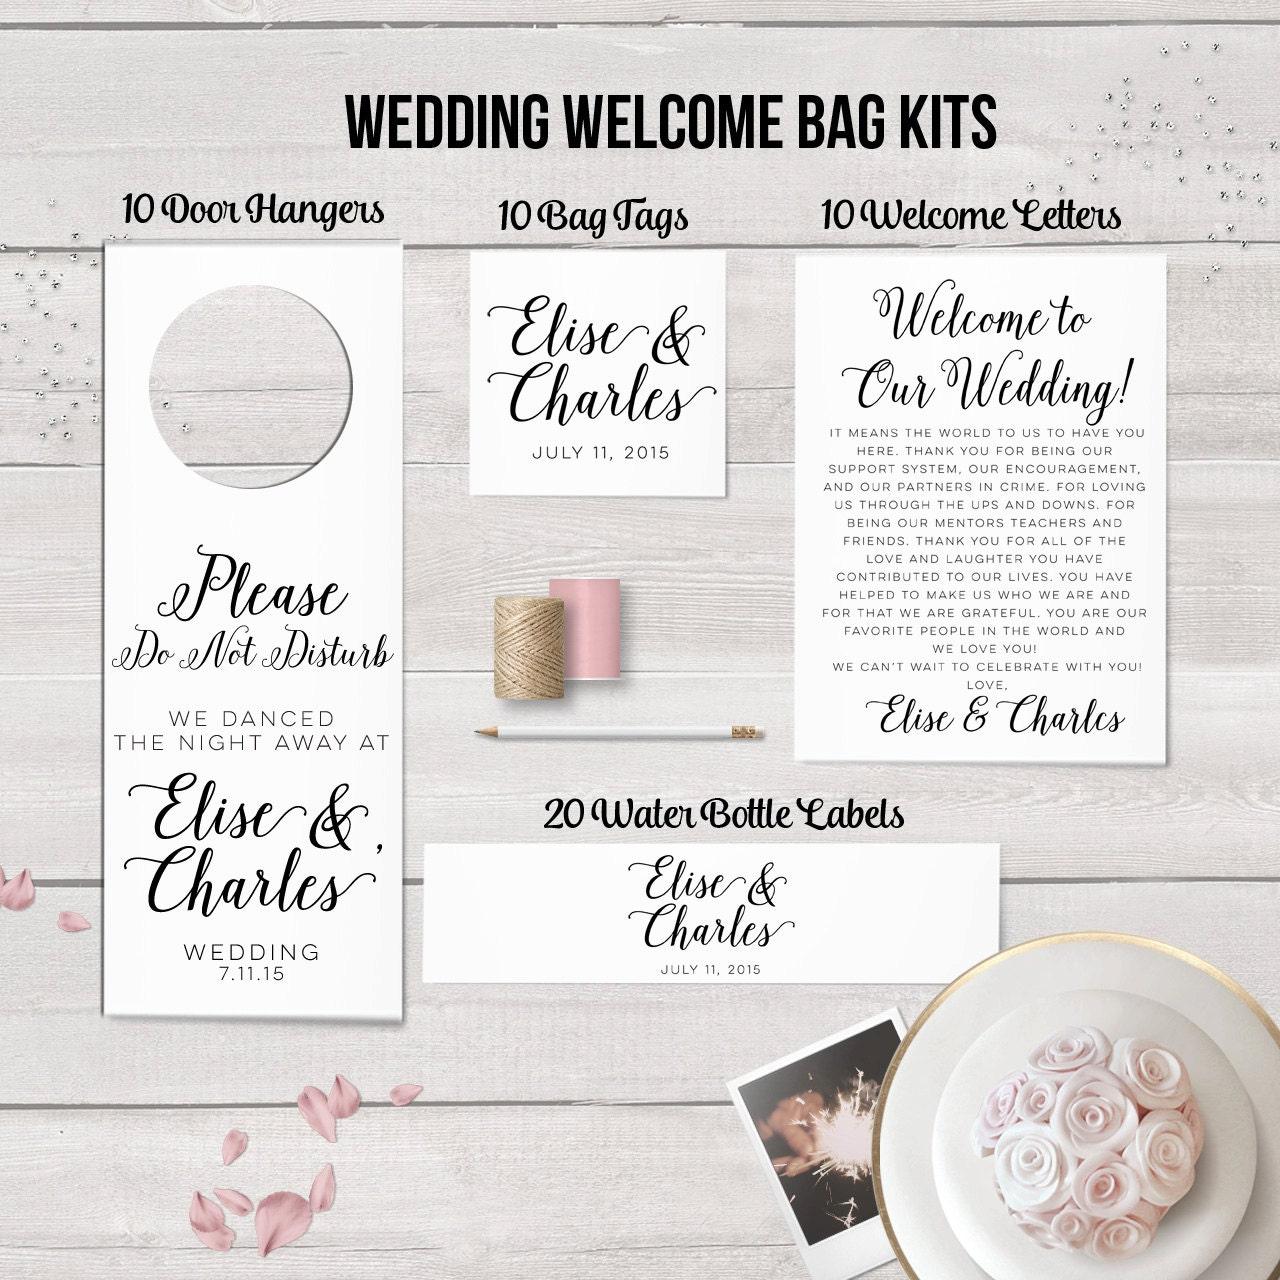 Wedding Welcome Bag Kit Destination Wedding Wedding Favors